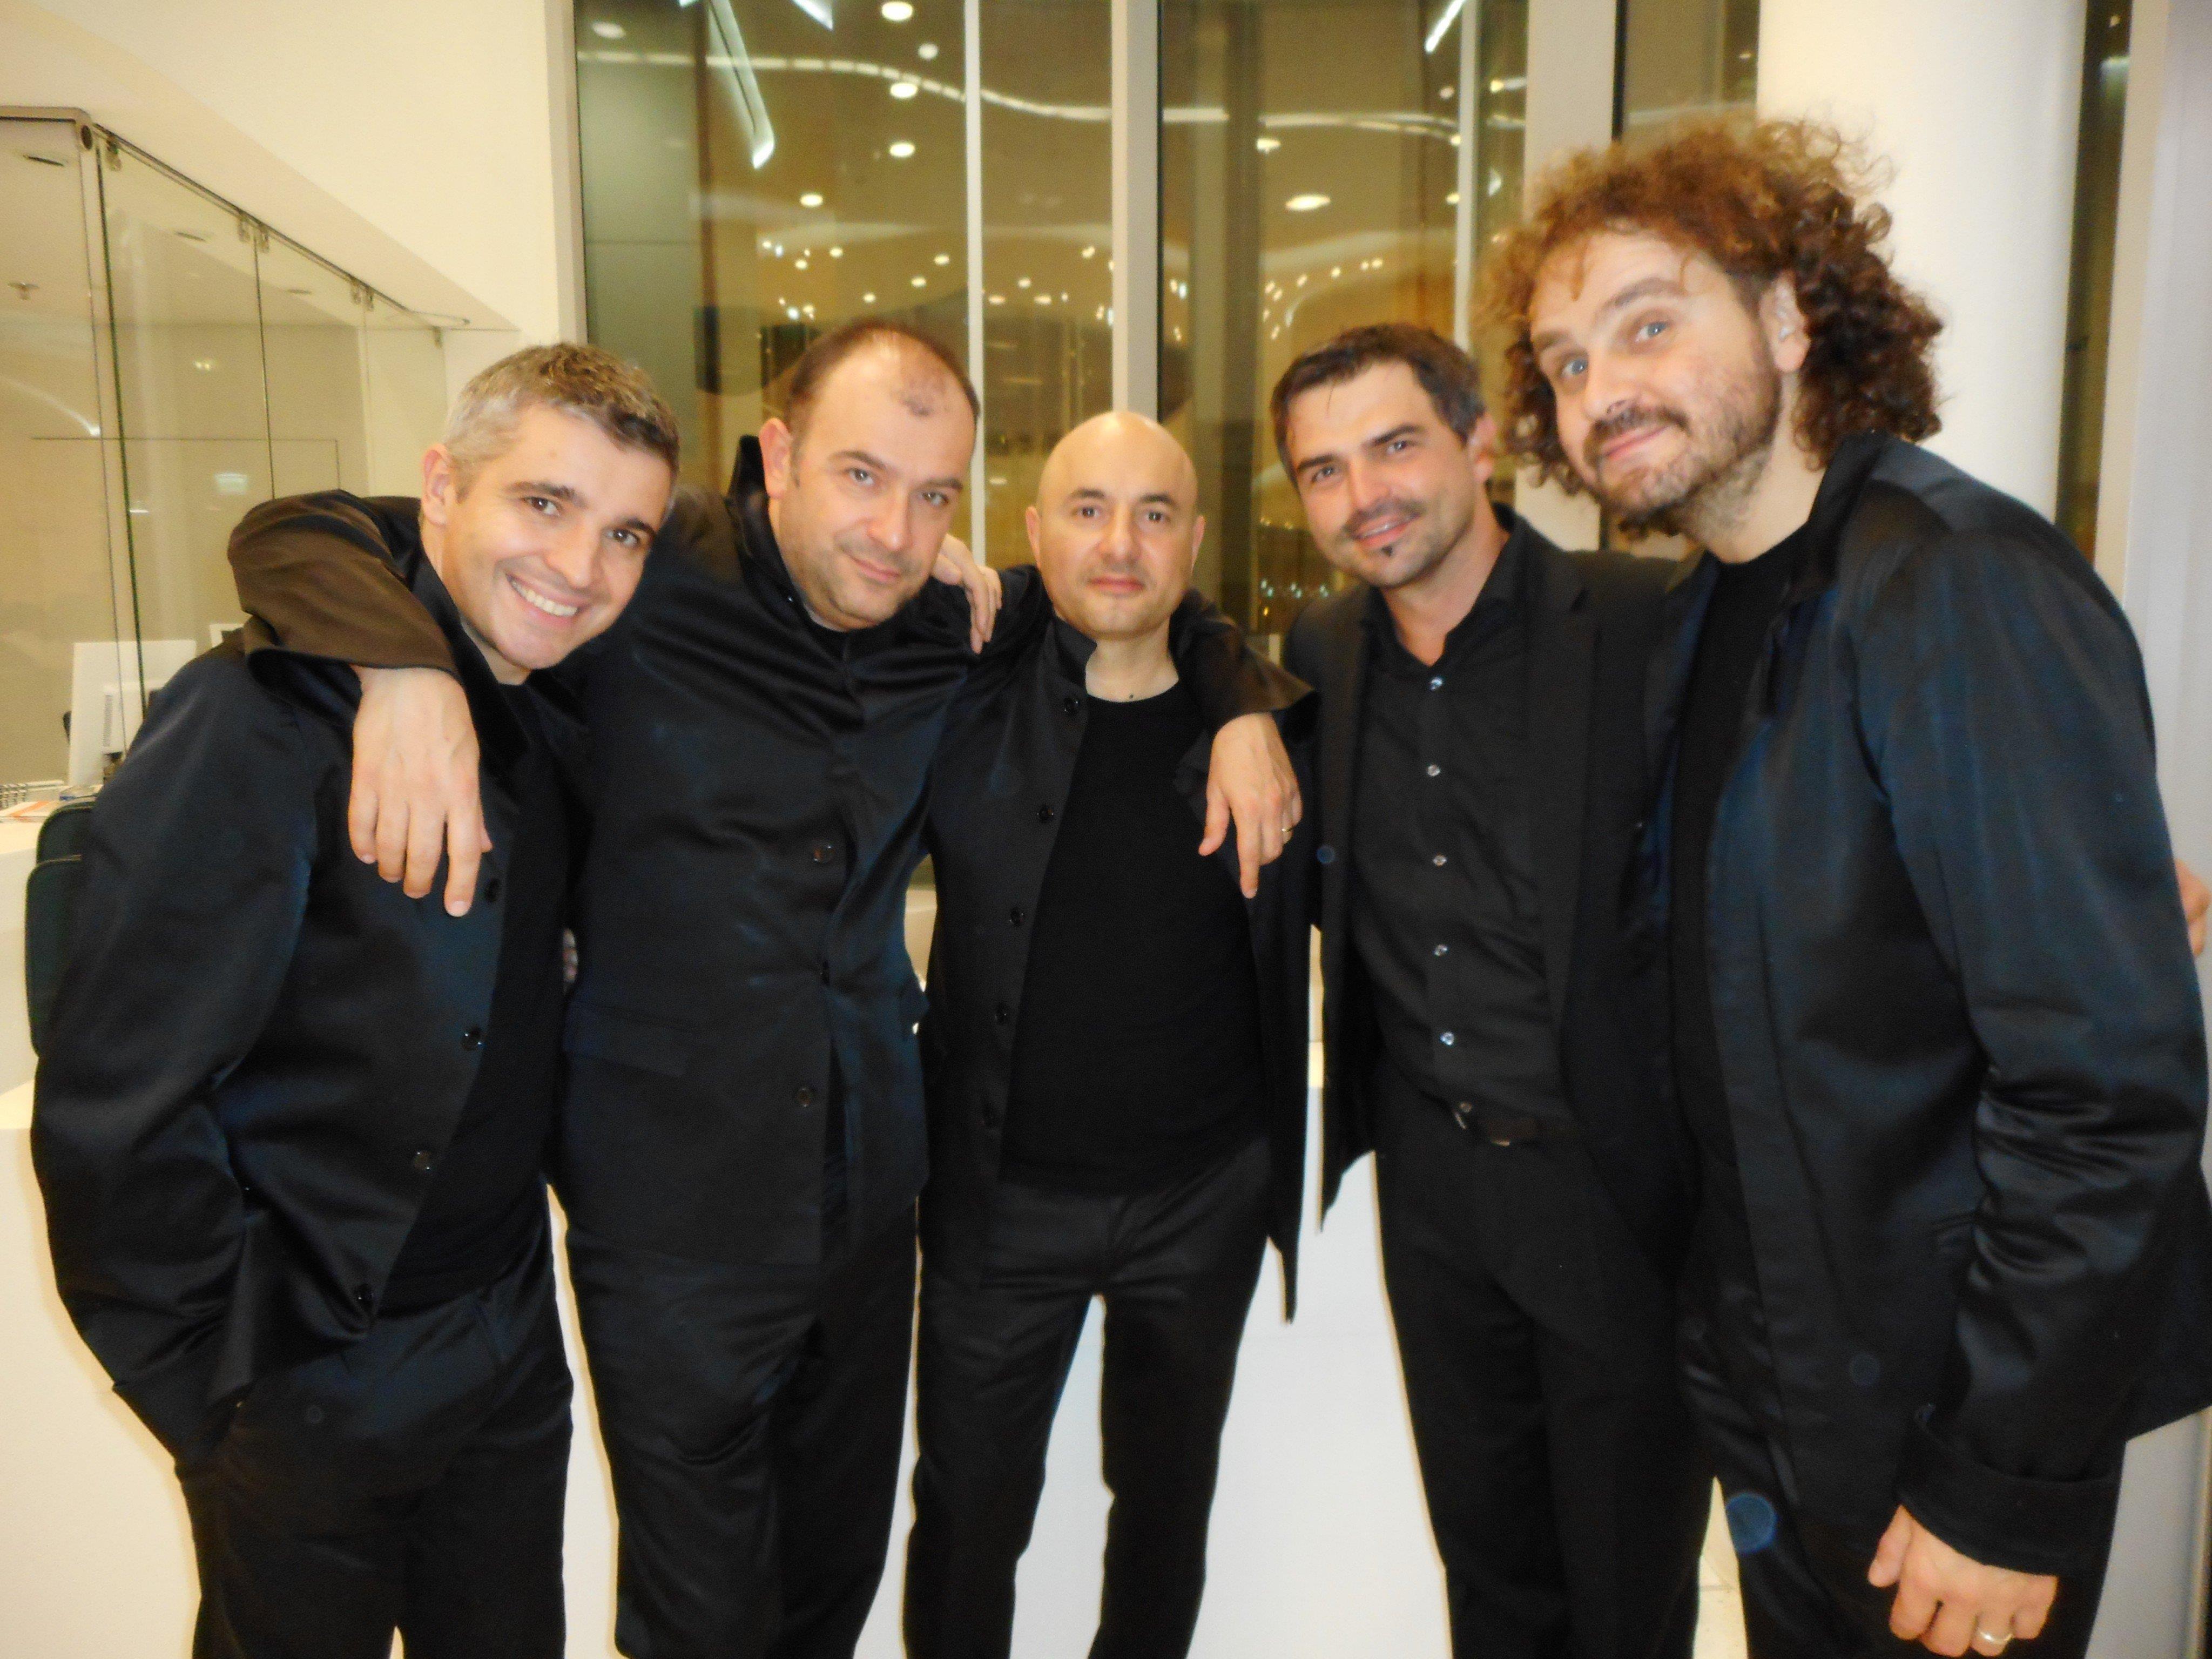 4/5 des Gomalan Brass Quintetts: Marco Braito, Nilo Caracristi, Gianluca Scipioni und Marco Pierobon mit dem Kapellmeister des MVA, Markus Lins (2. von rechts).